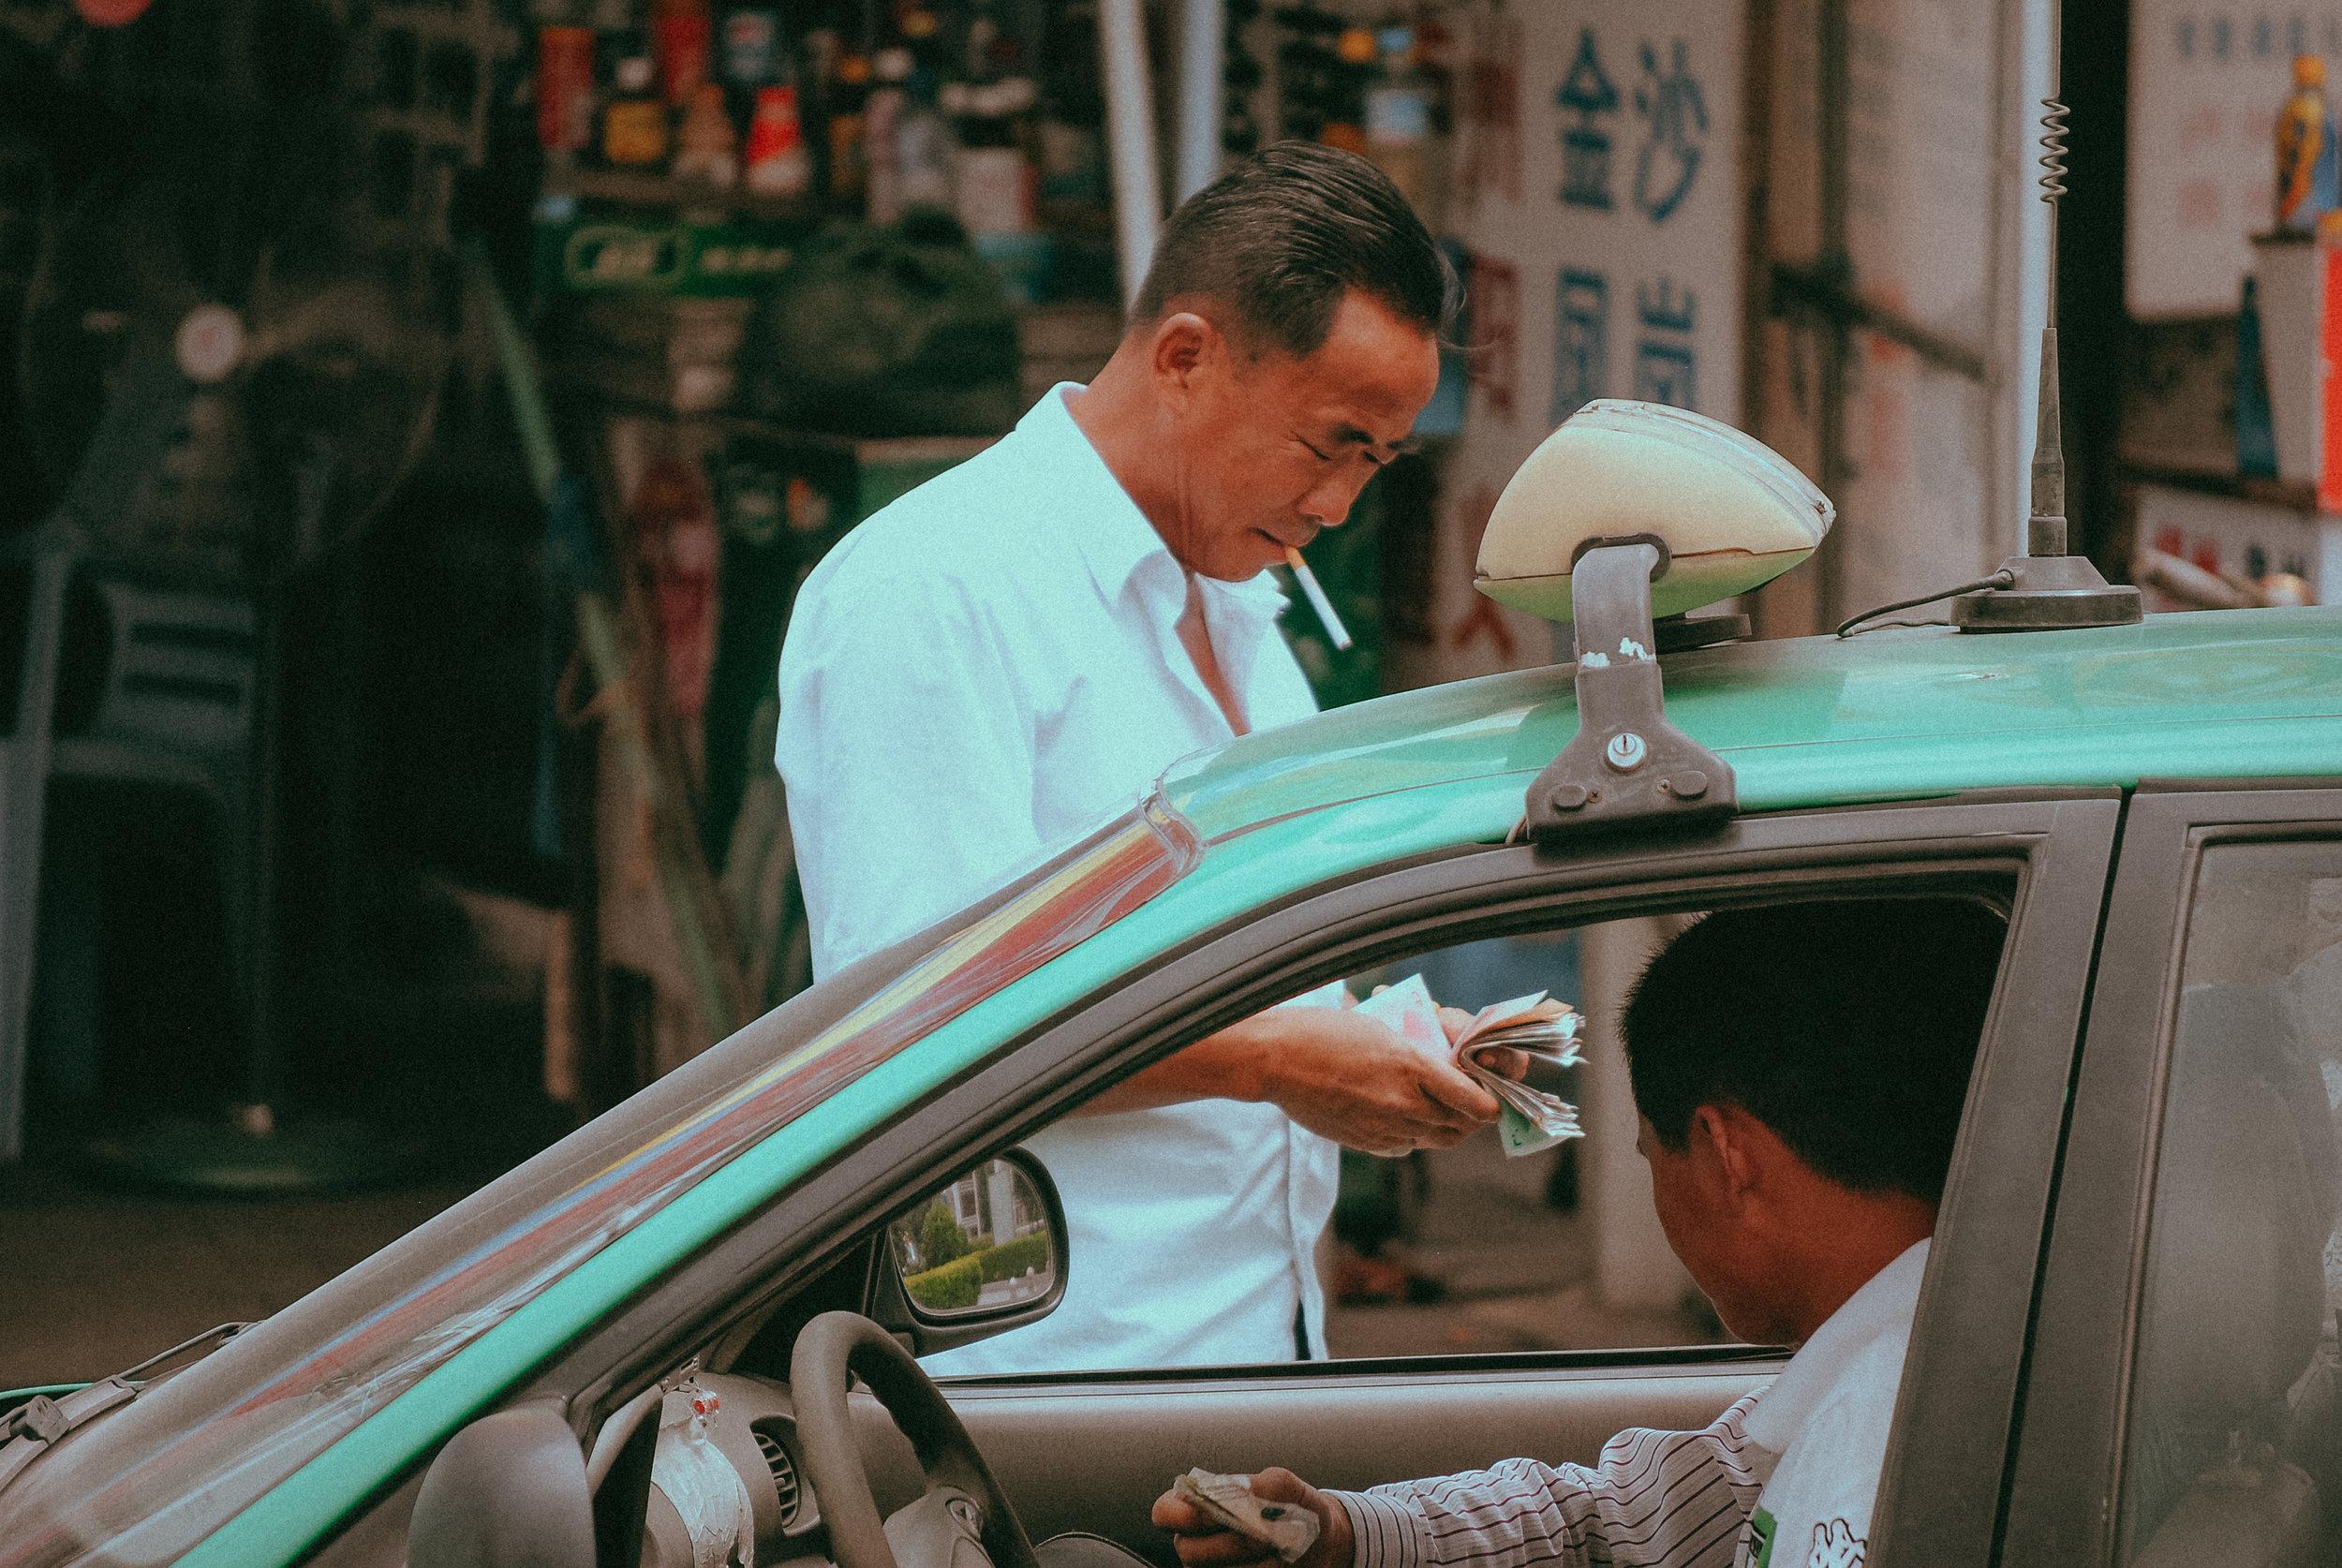 jonathan-burkhart-photographer-oklahoma-city-hongkong-china-525.jpg